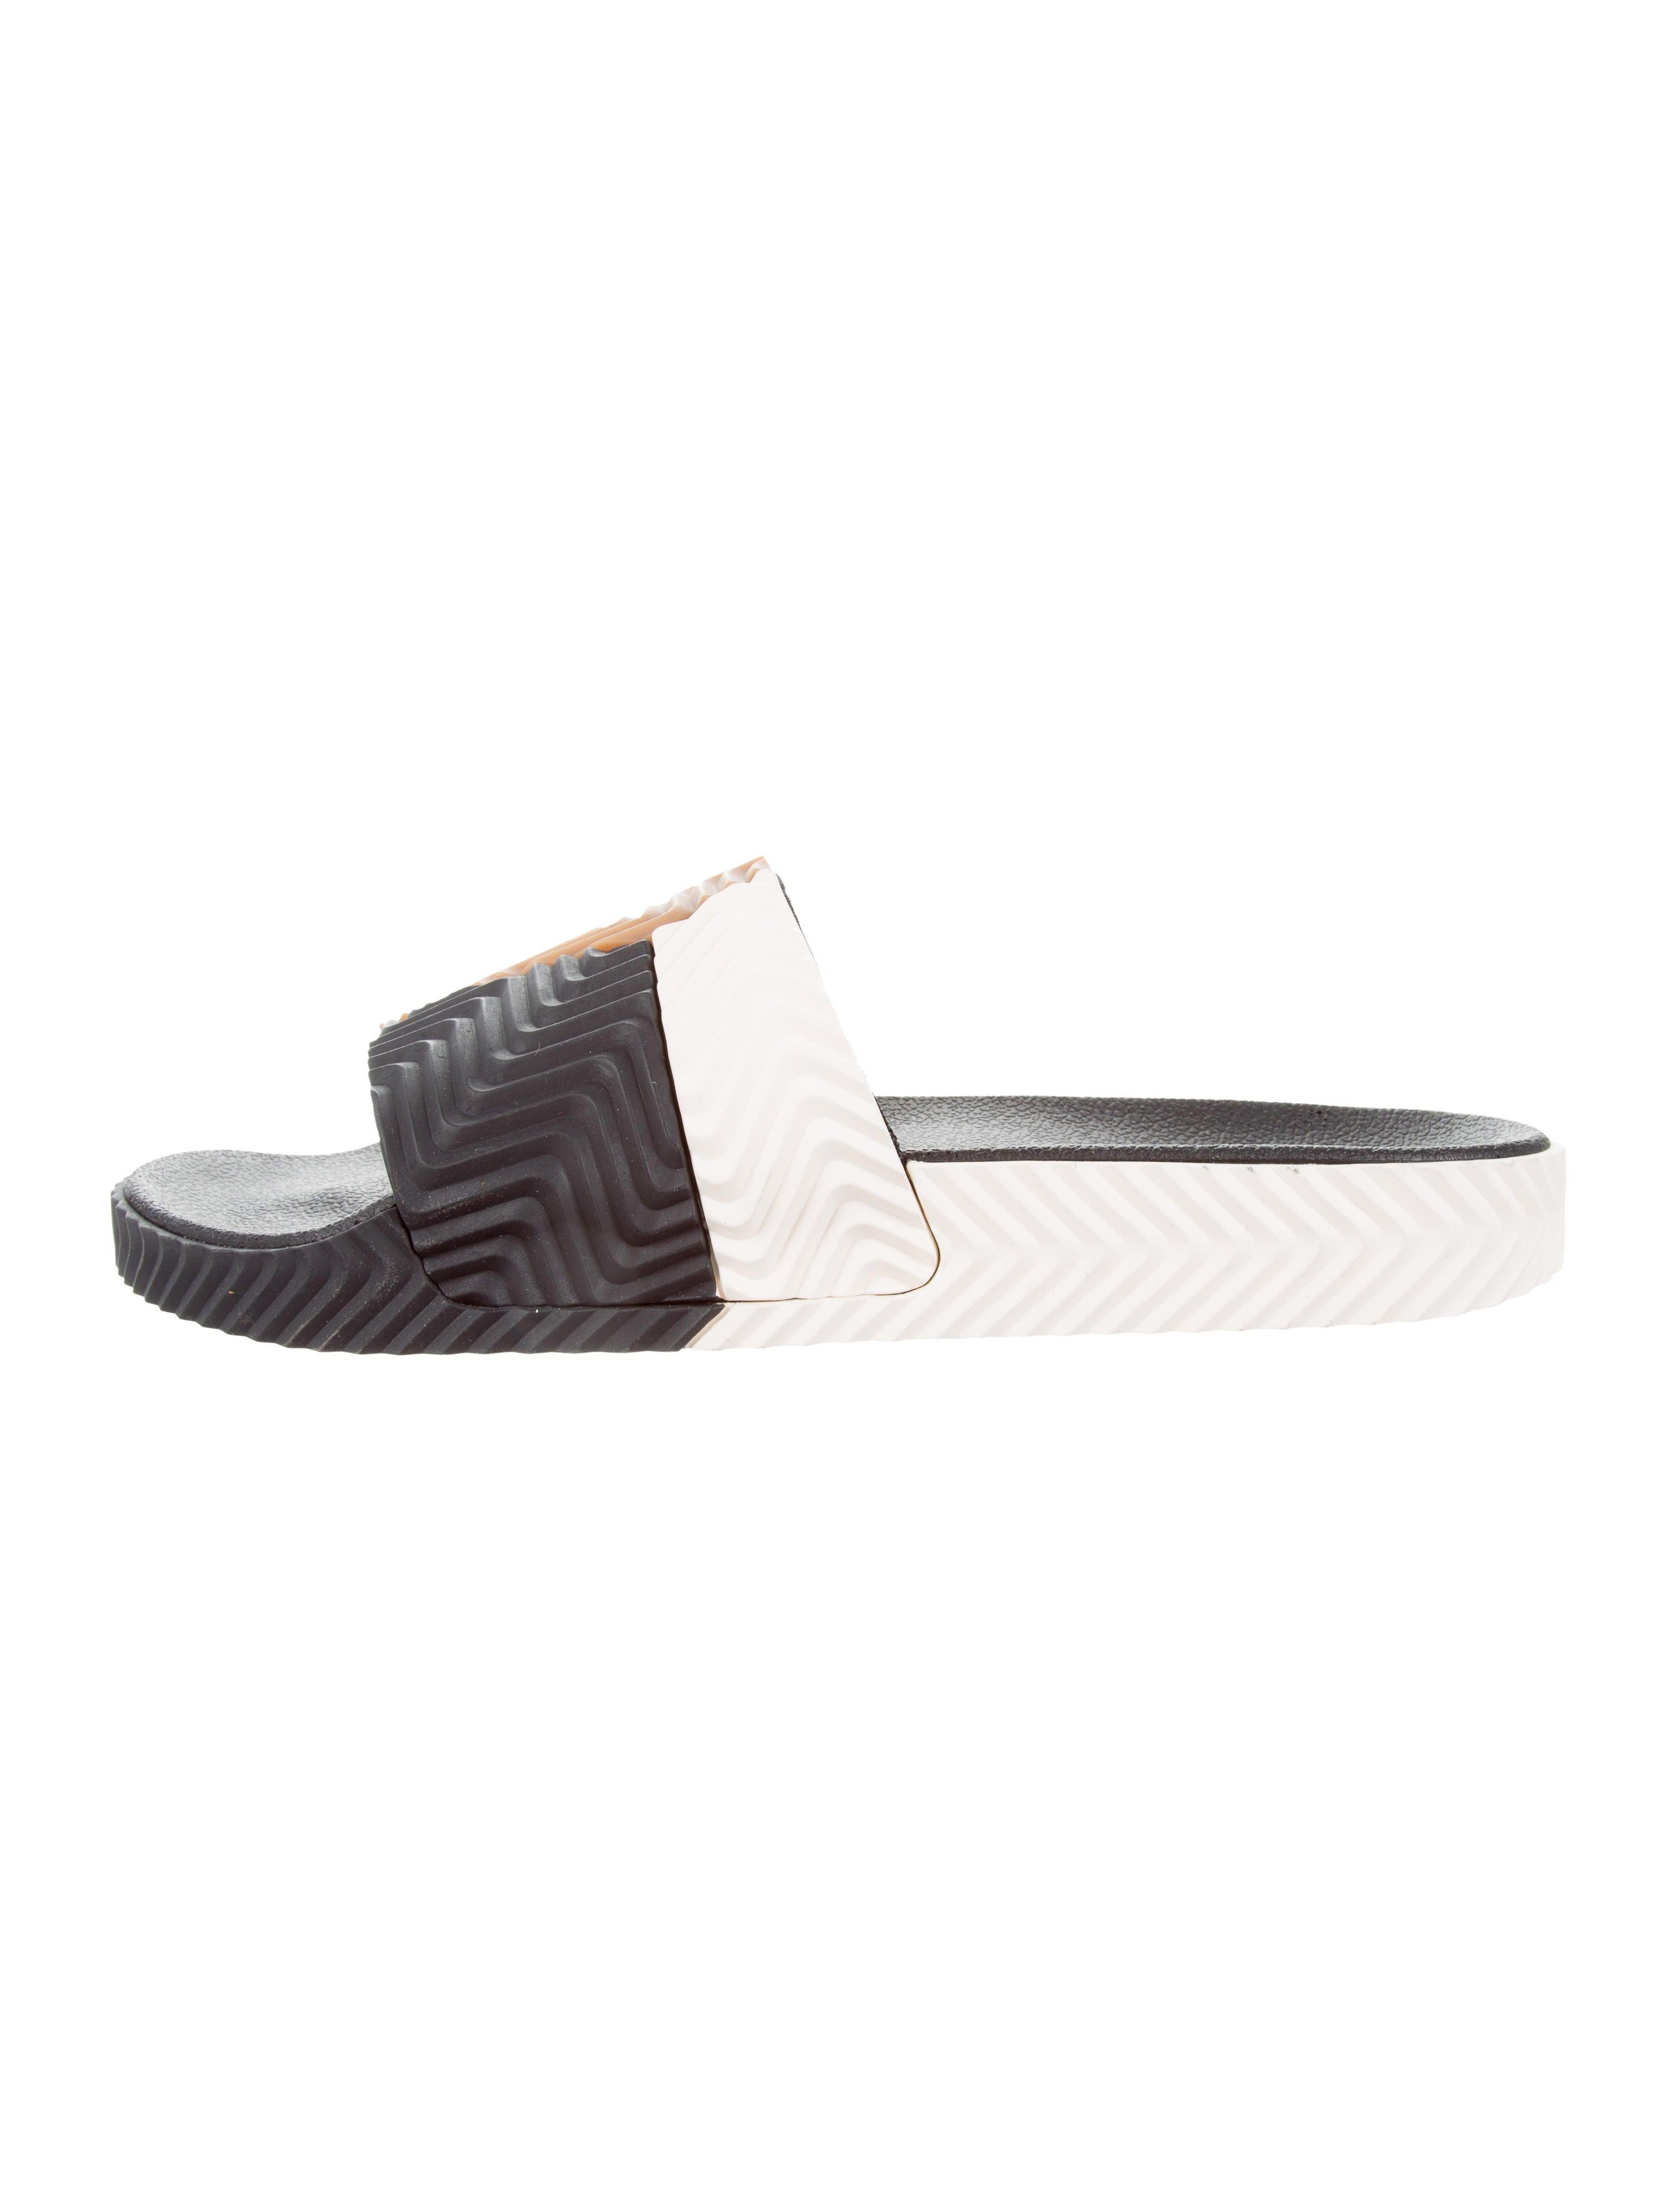 the latest fcaa8 6ec02 Adilette Slide Sandals